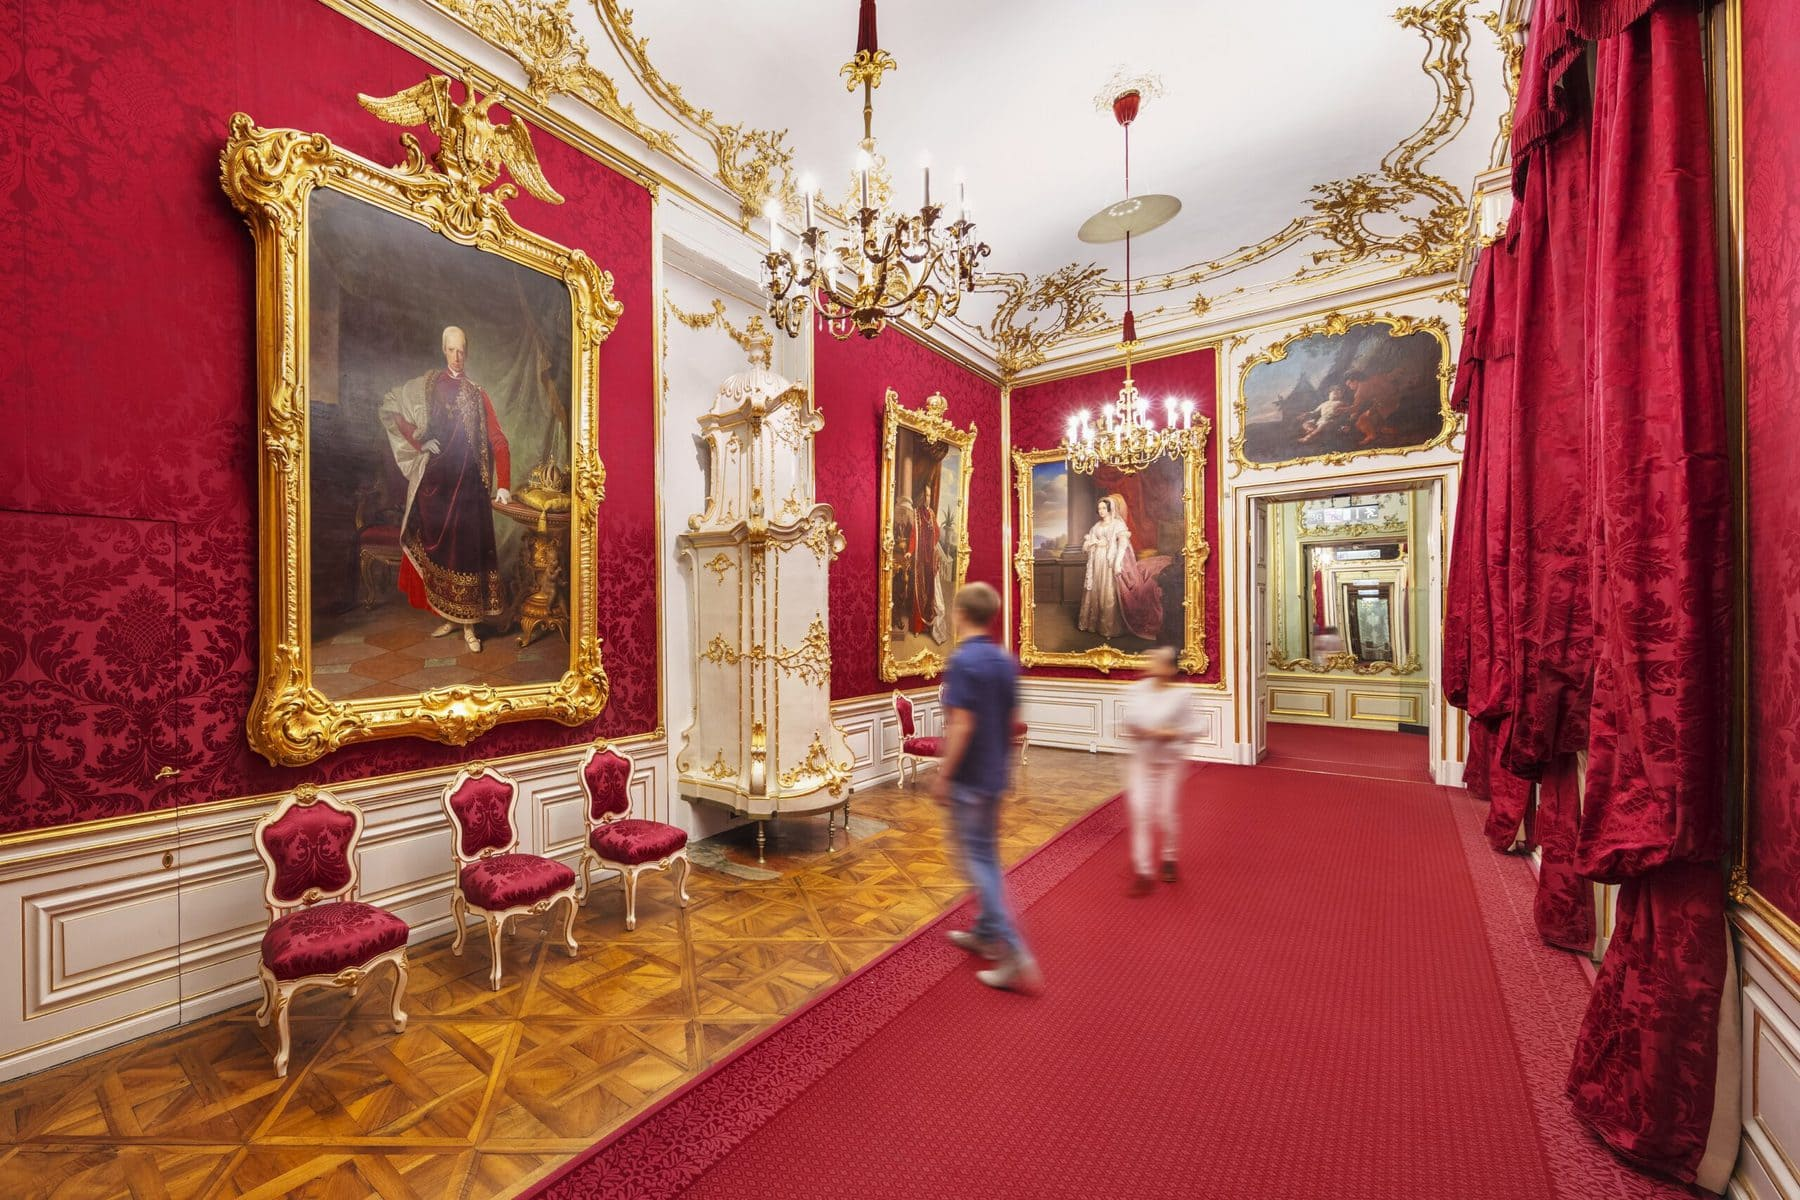 Schloss Schönbrunn Wien, Roter Salon © Schloß Schönbrunn Kultur- und Betriebsges.m.b.H._Severin Wurnig